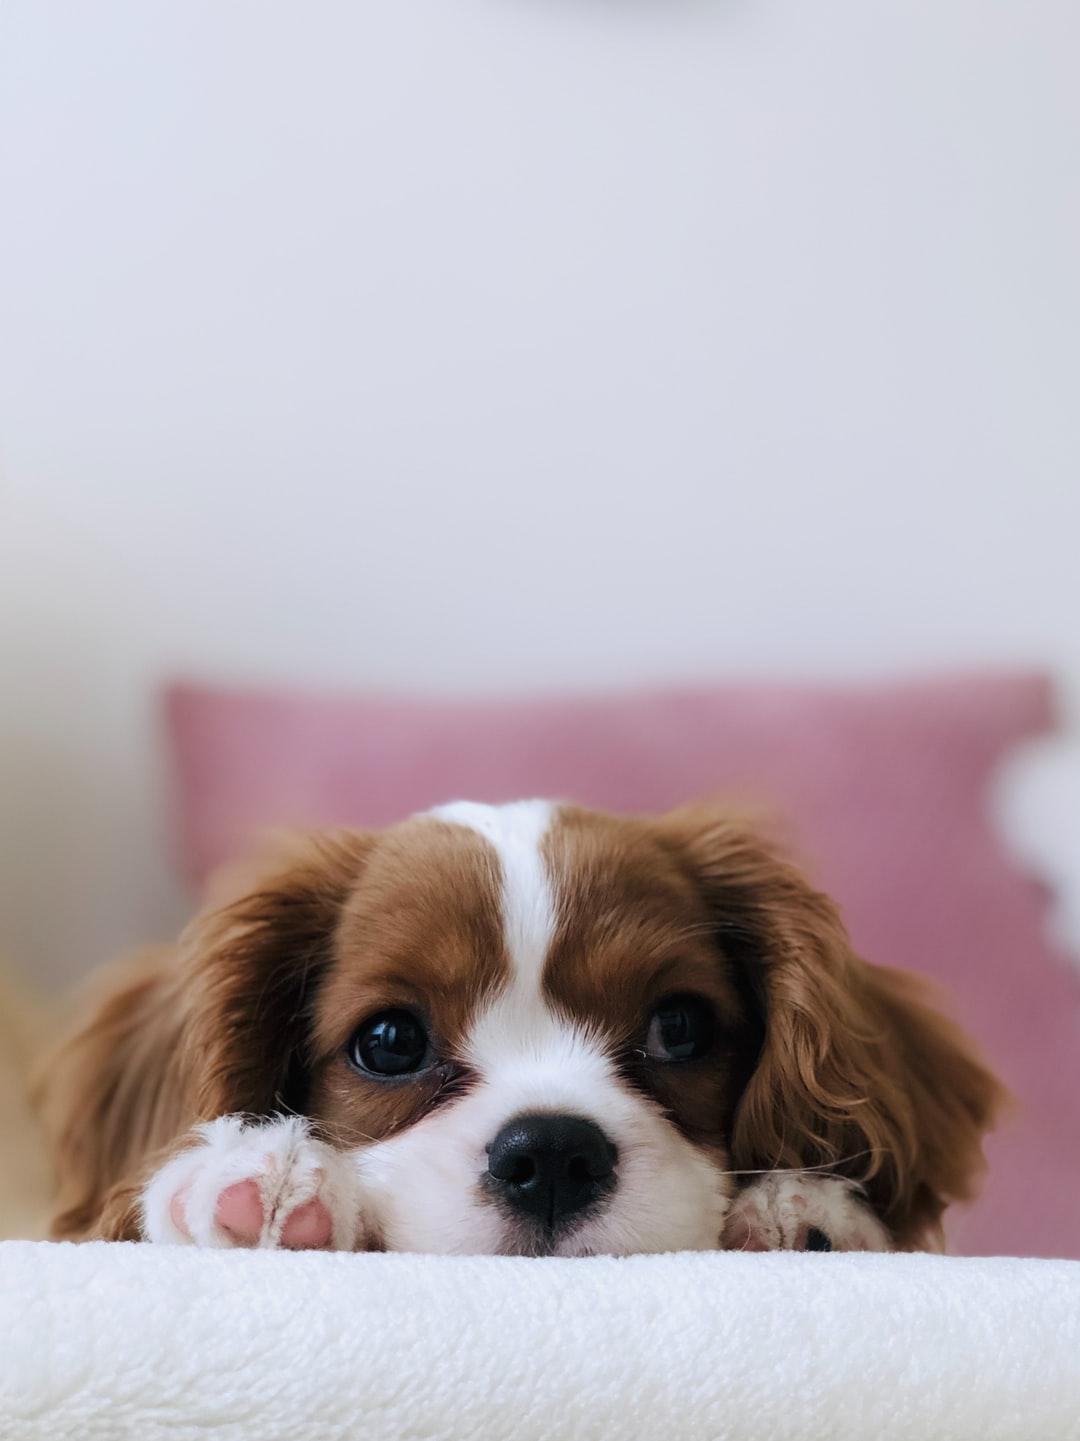 Cute Dog Wallpaper   NawPic 1080x1441